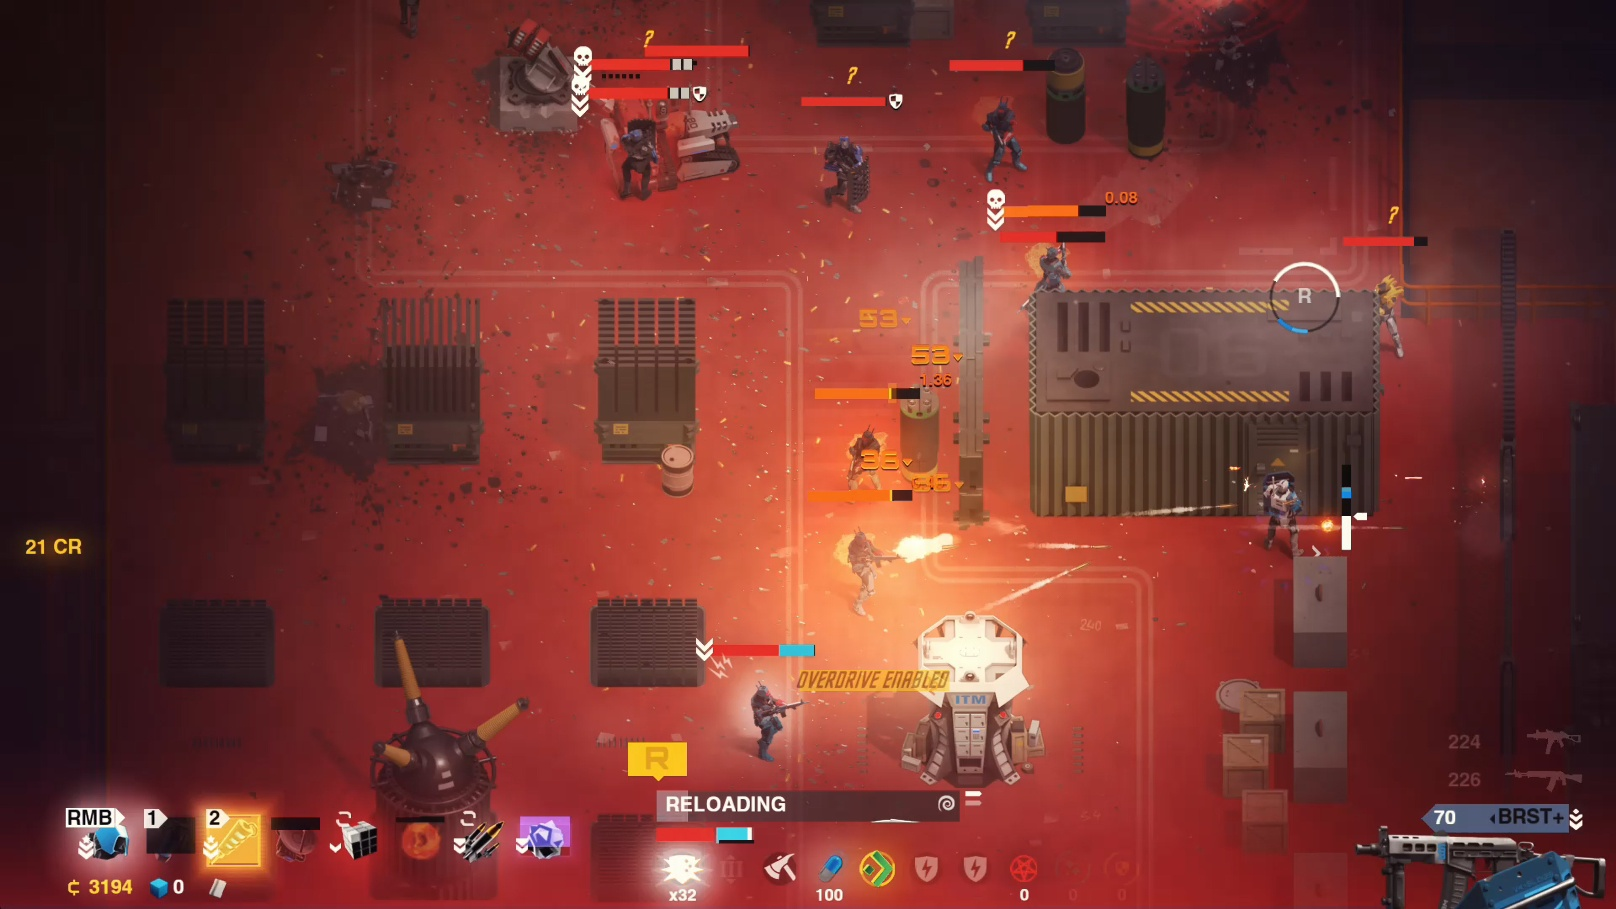 synthetik-legion-rising-pc-screenshot-02